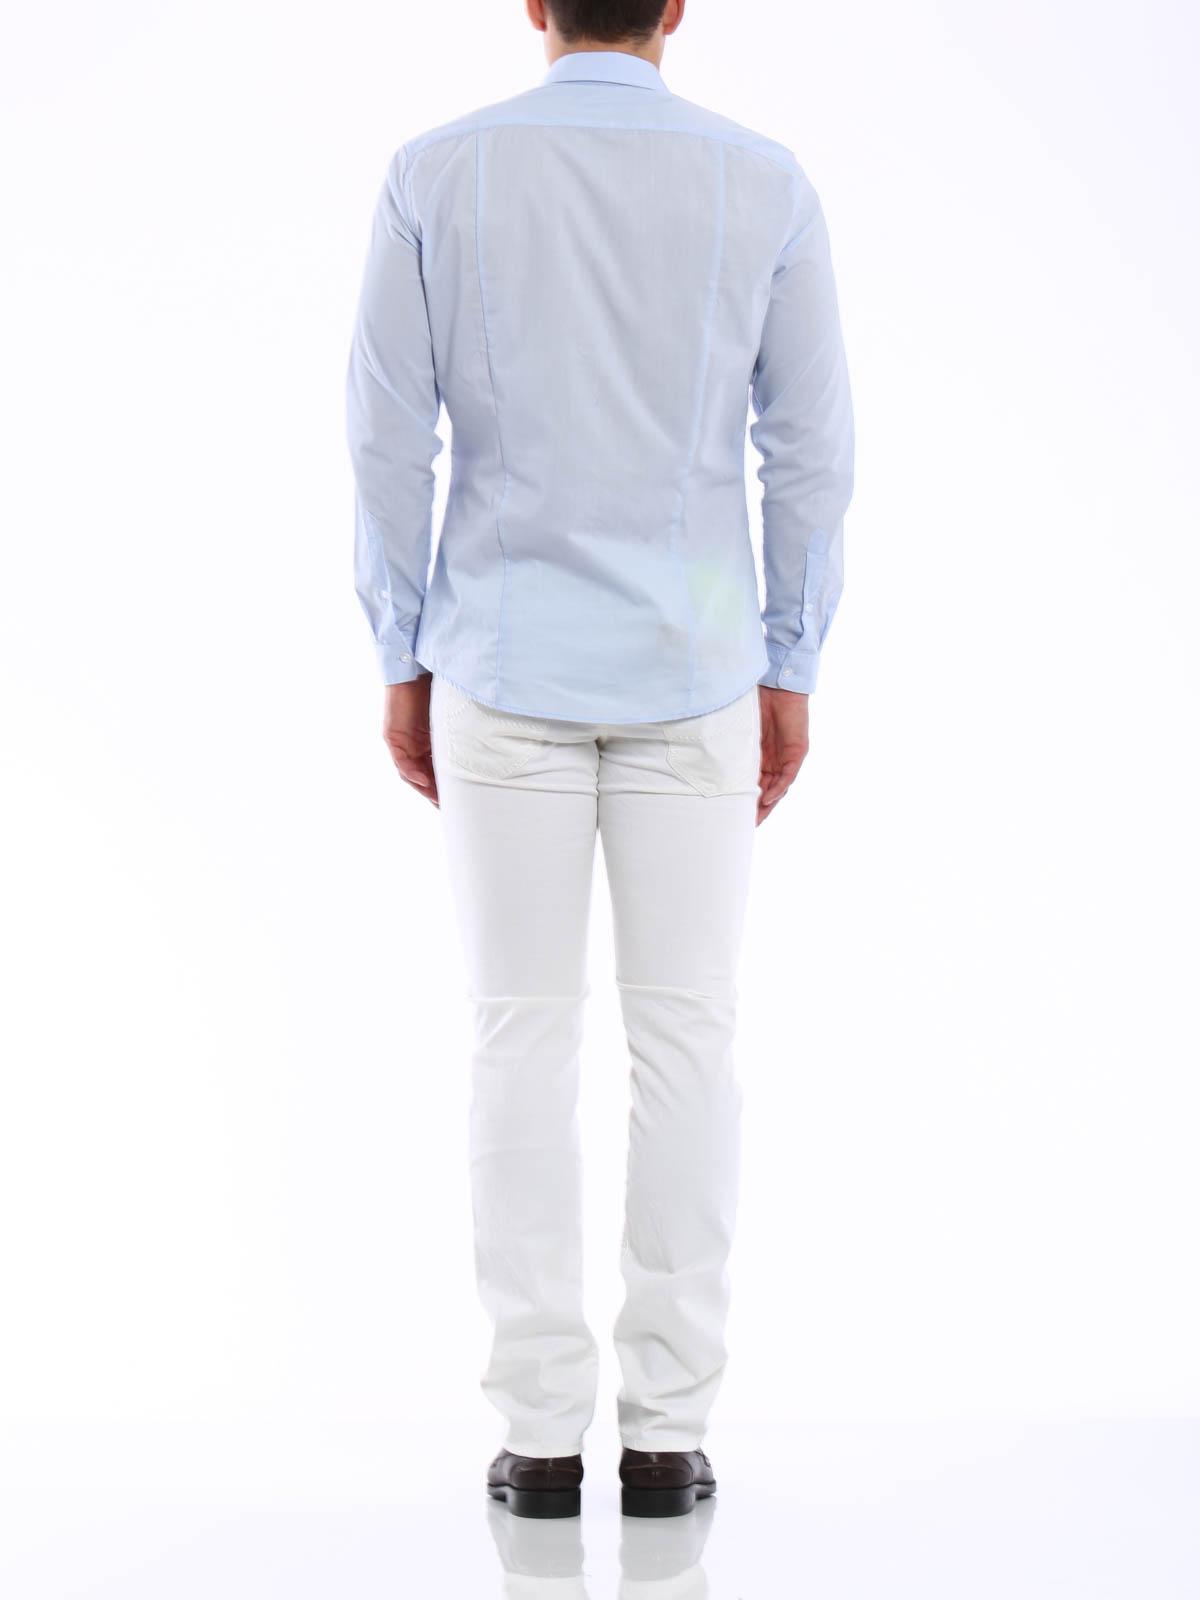 jeans j622 match jacob cohen jeans dritti a sigaretta. Black Bedroom Furniture Sets. Home Design Ideas